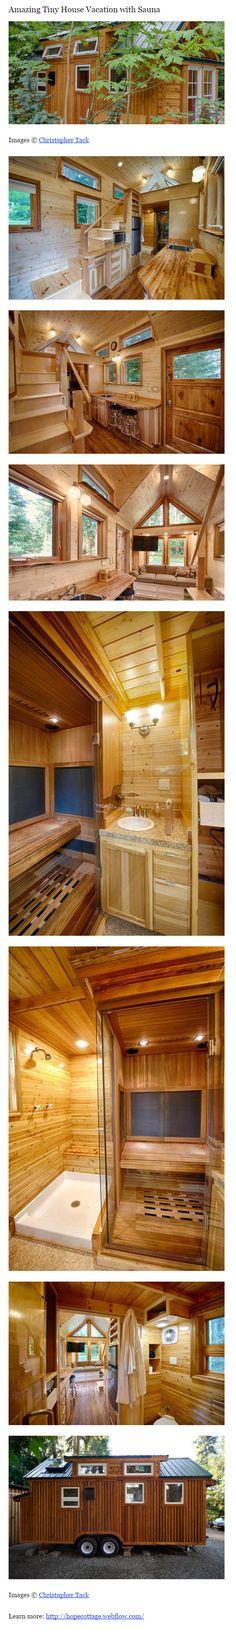 Amazing Tiny House with a sauna. Tiny House On Wheels, Small House Plans, Micro House, Tiny House Movement, Tiny Spaces, Tiny House Living, Tiny House Design, Little Houses, Tiny Homes